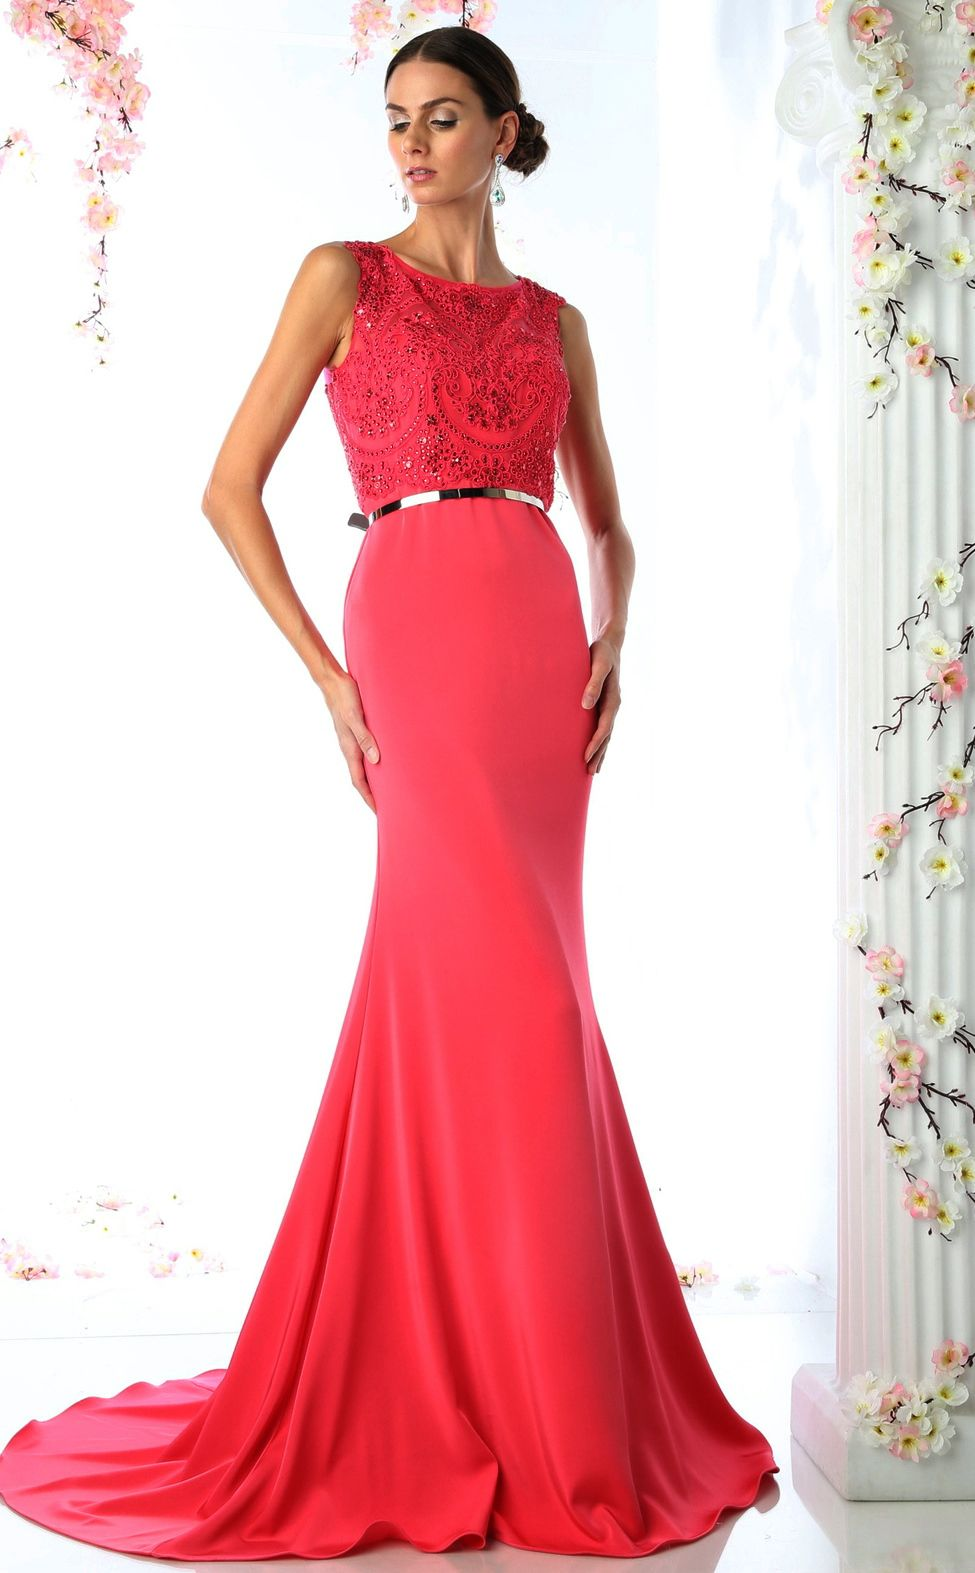 Prom dresses evening dresses by cinderellaucbrueaddjucbruesparkling